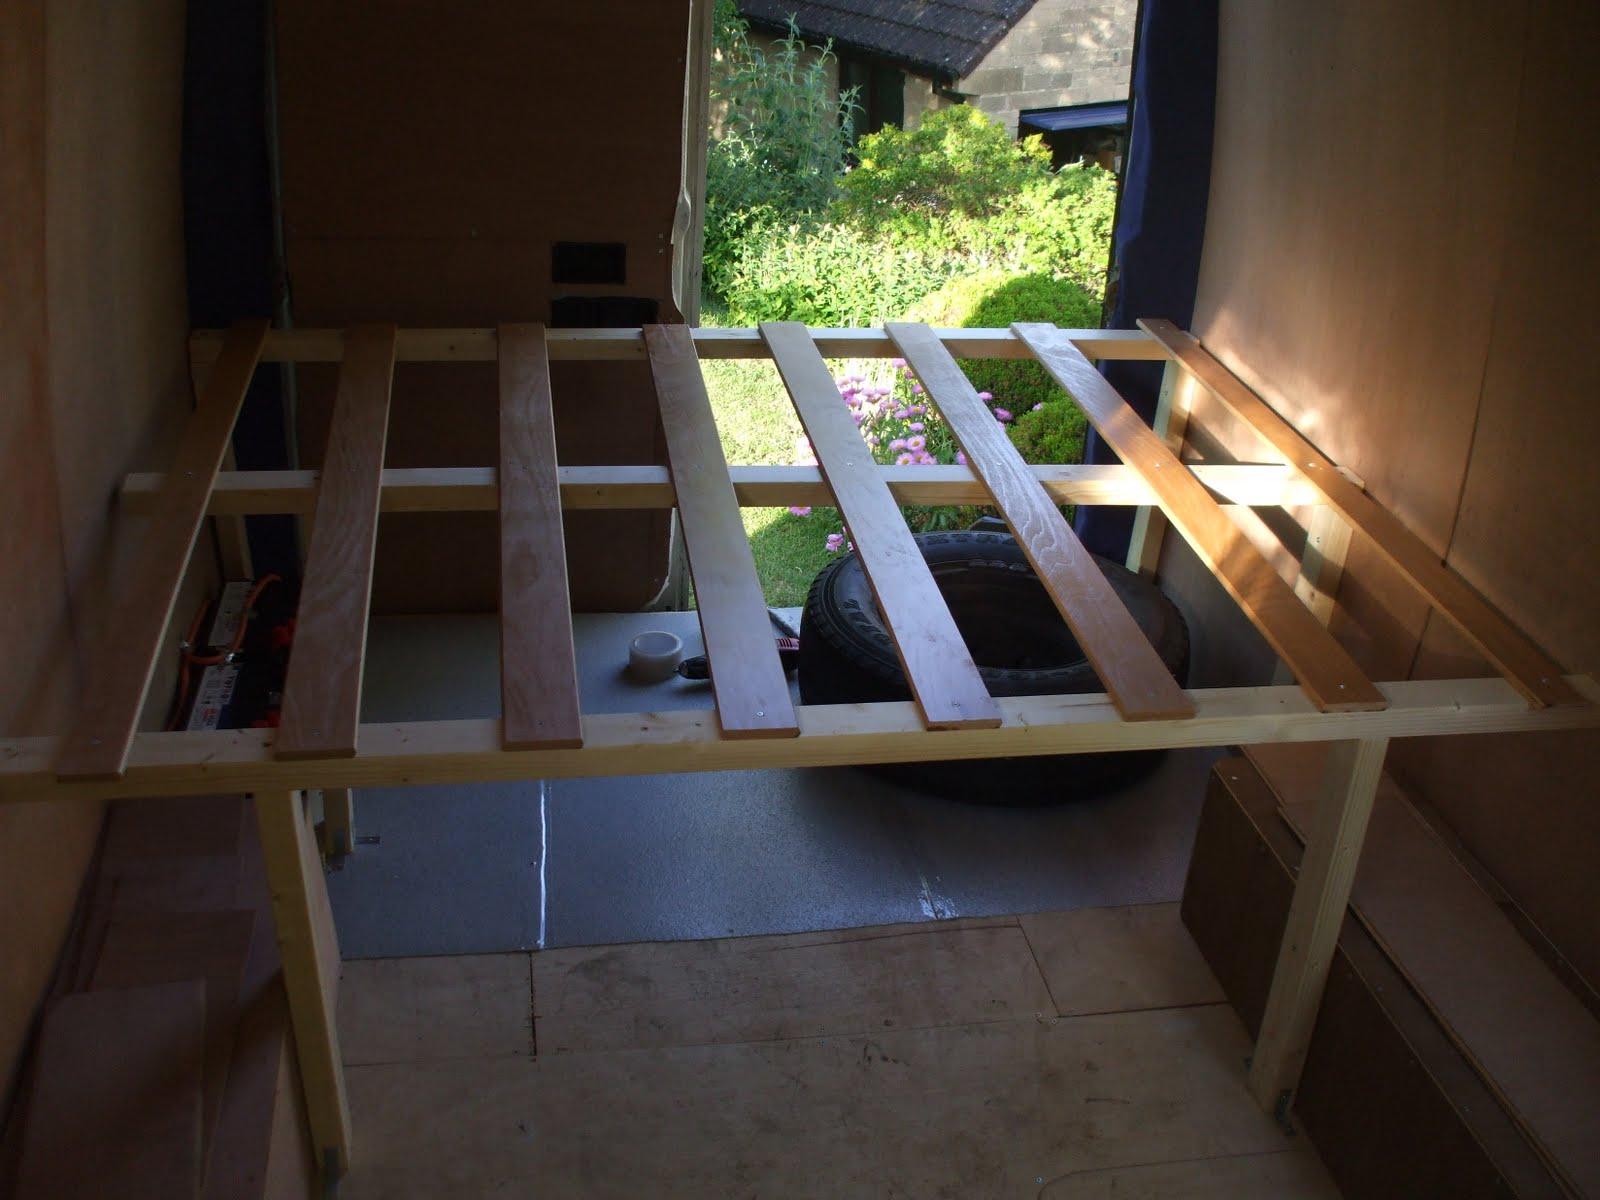 jodie and keef 39 s campervan project building furniture. Black Bedroom Furniture Sets. Home Design Ideas